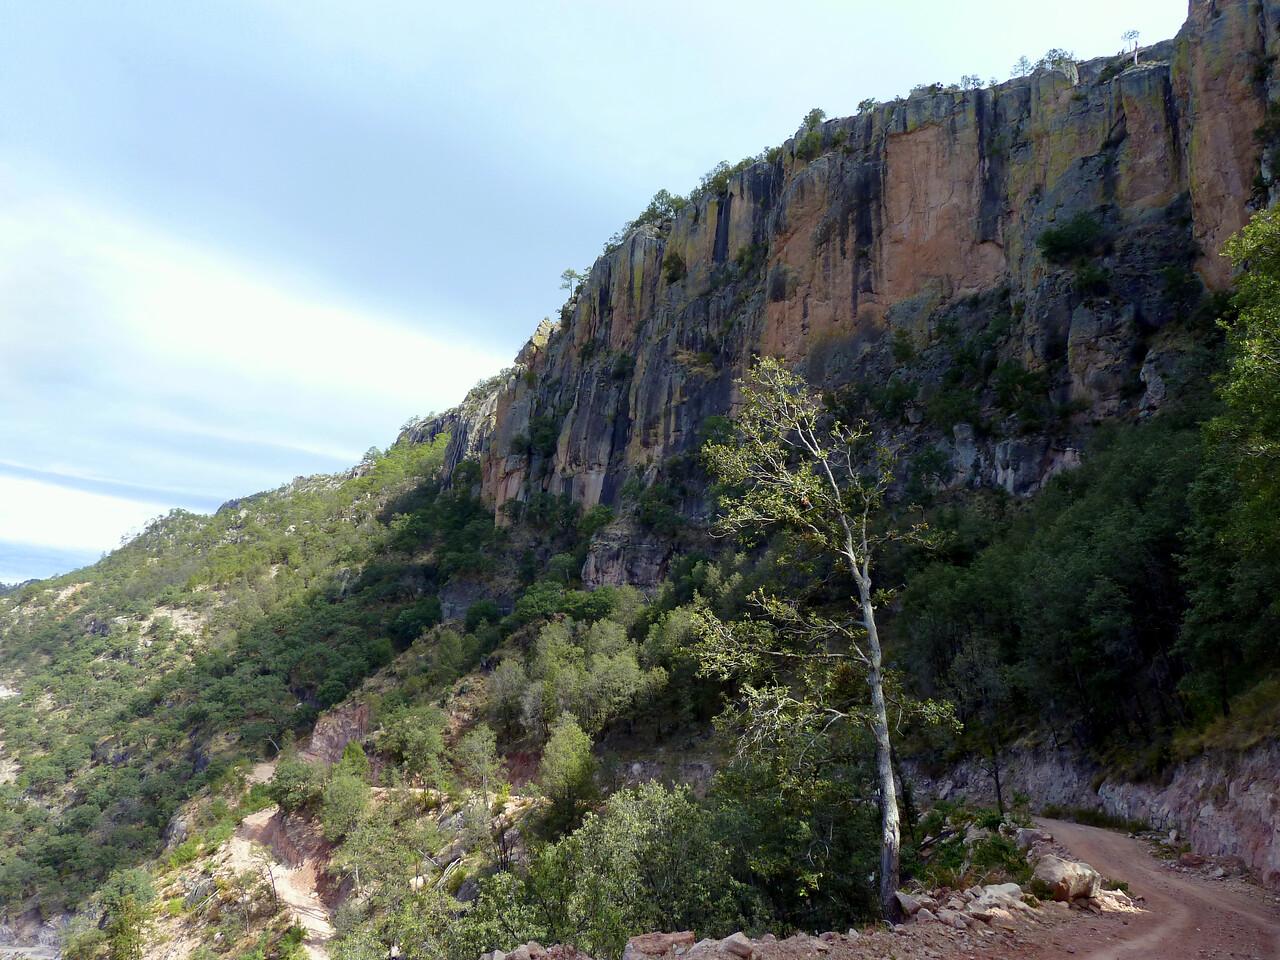 Descent and cliffs.